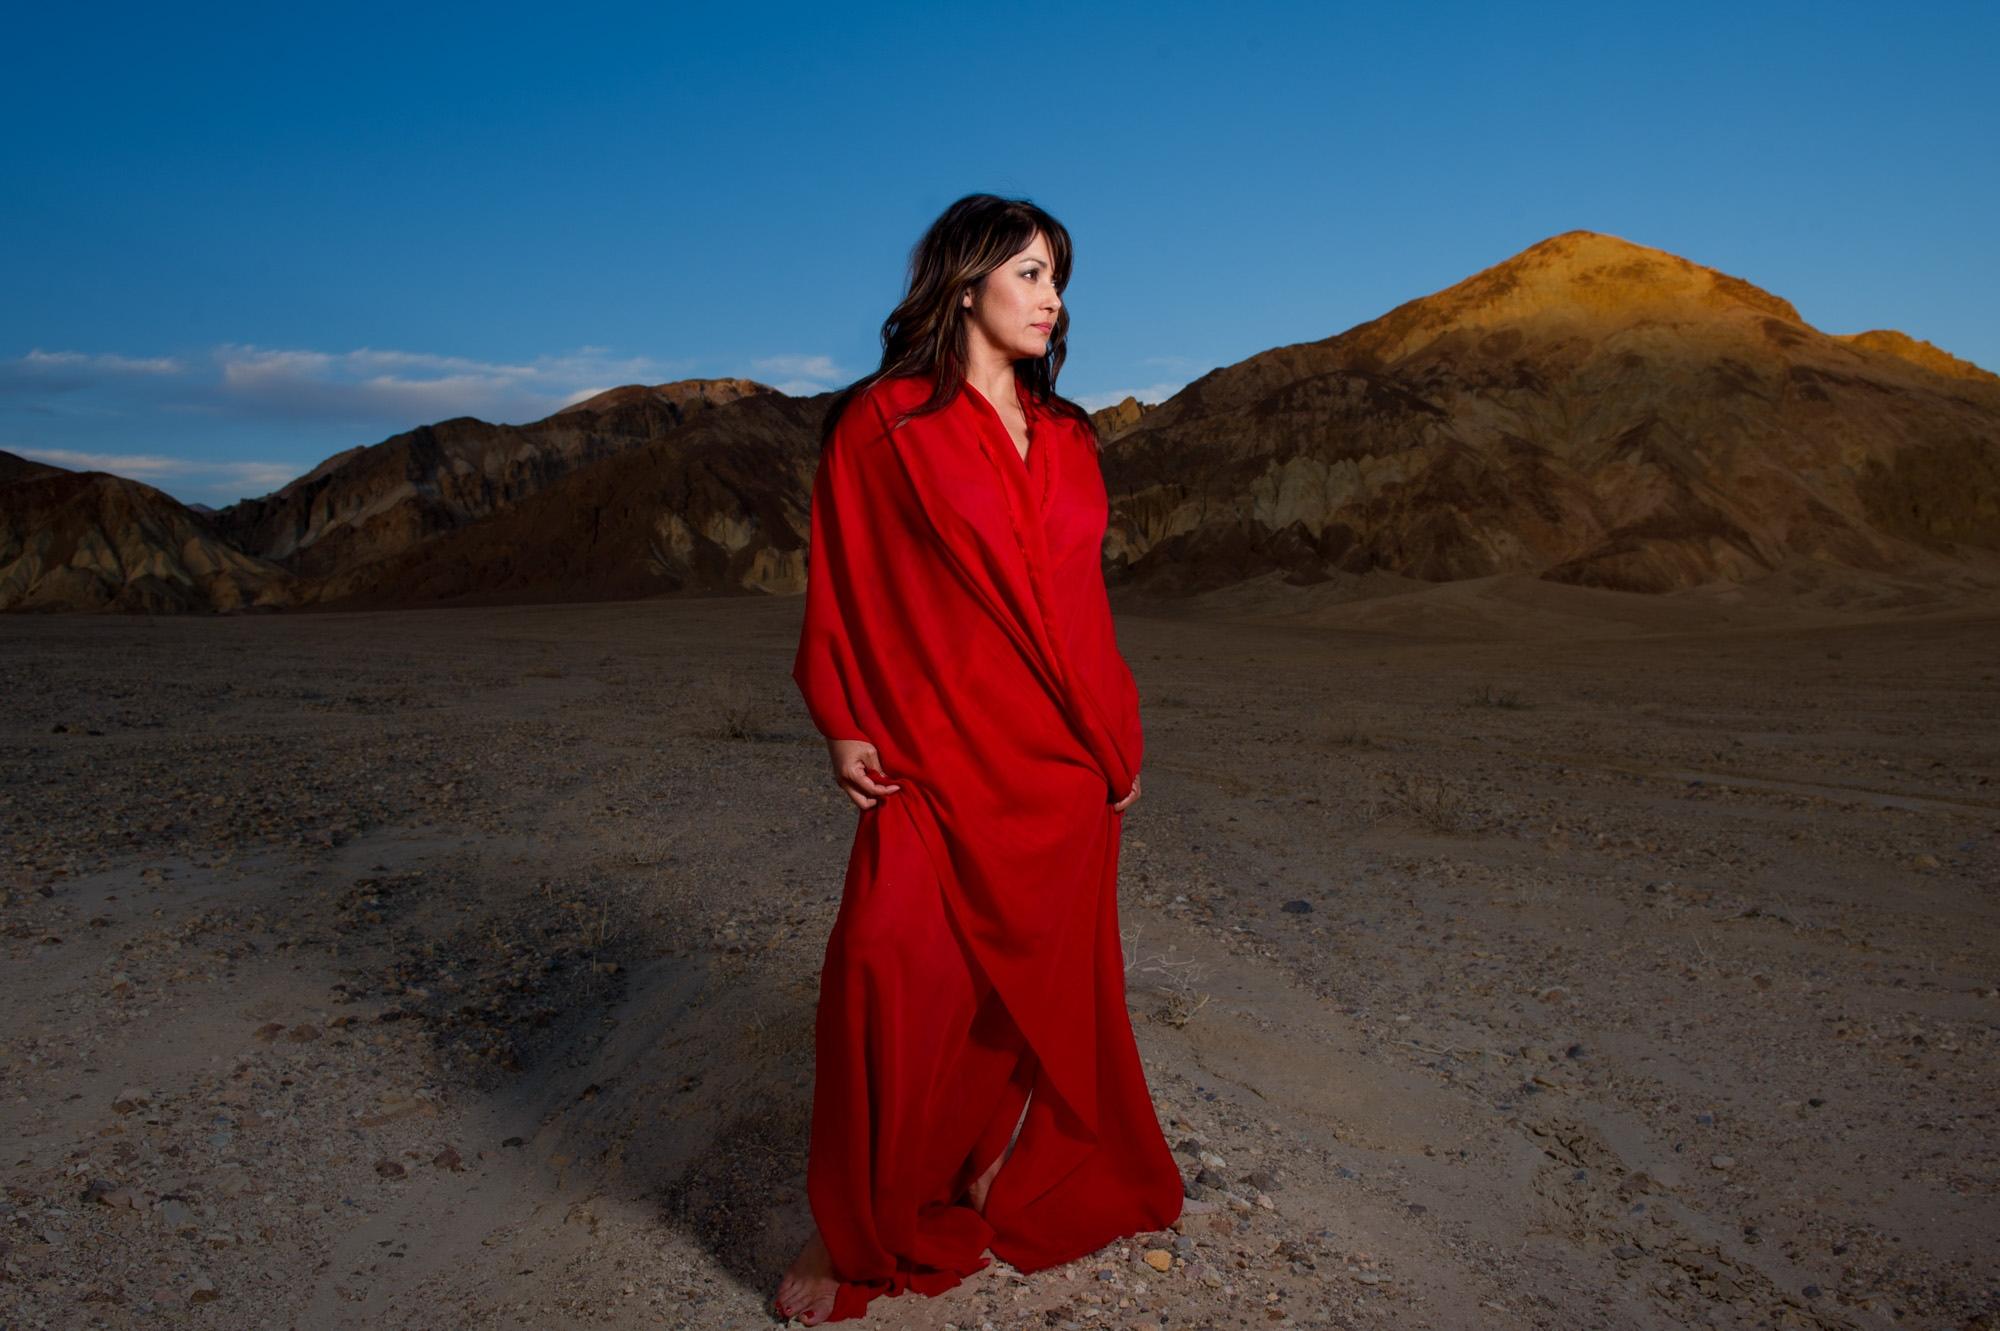 Gina Silva Death Valley National Park, California